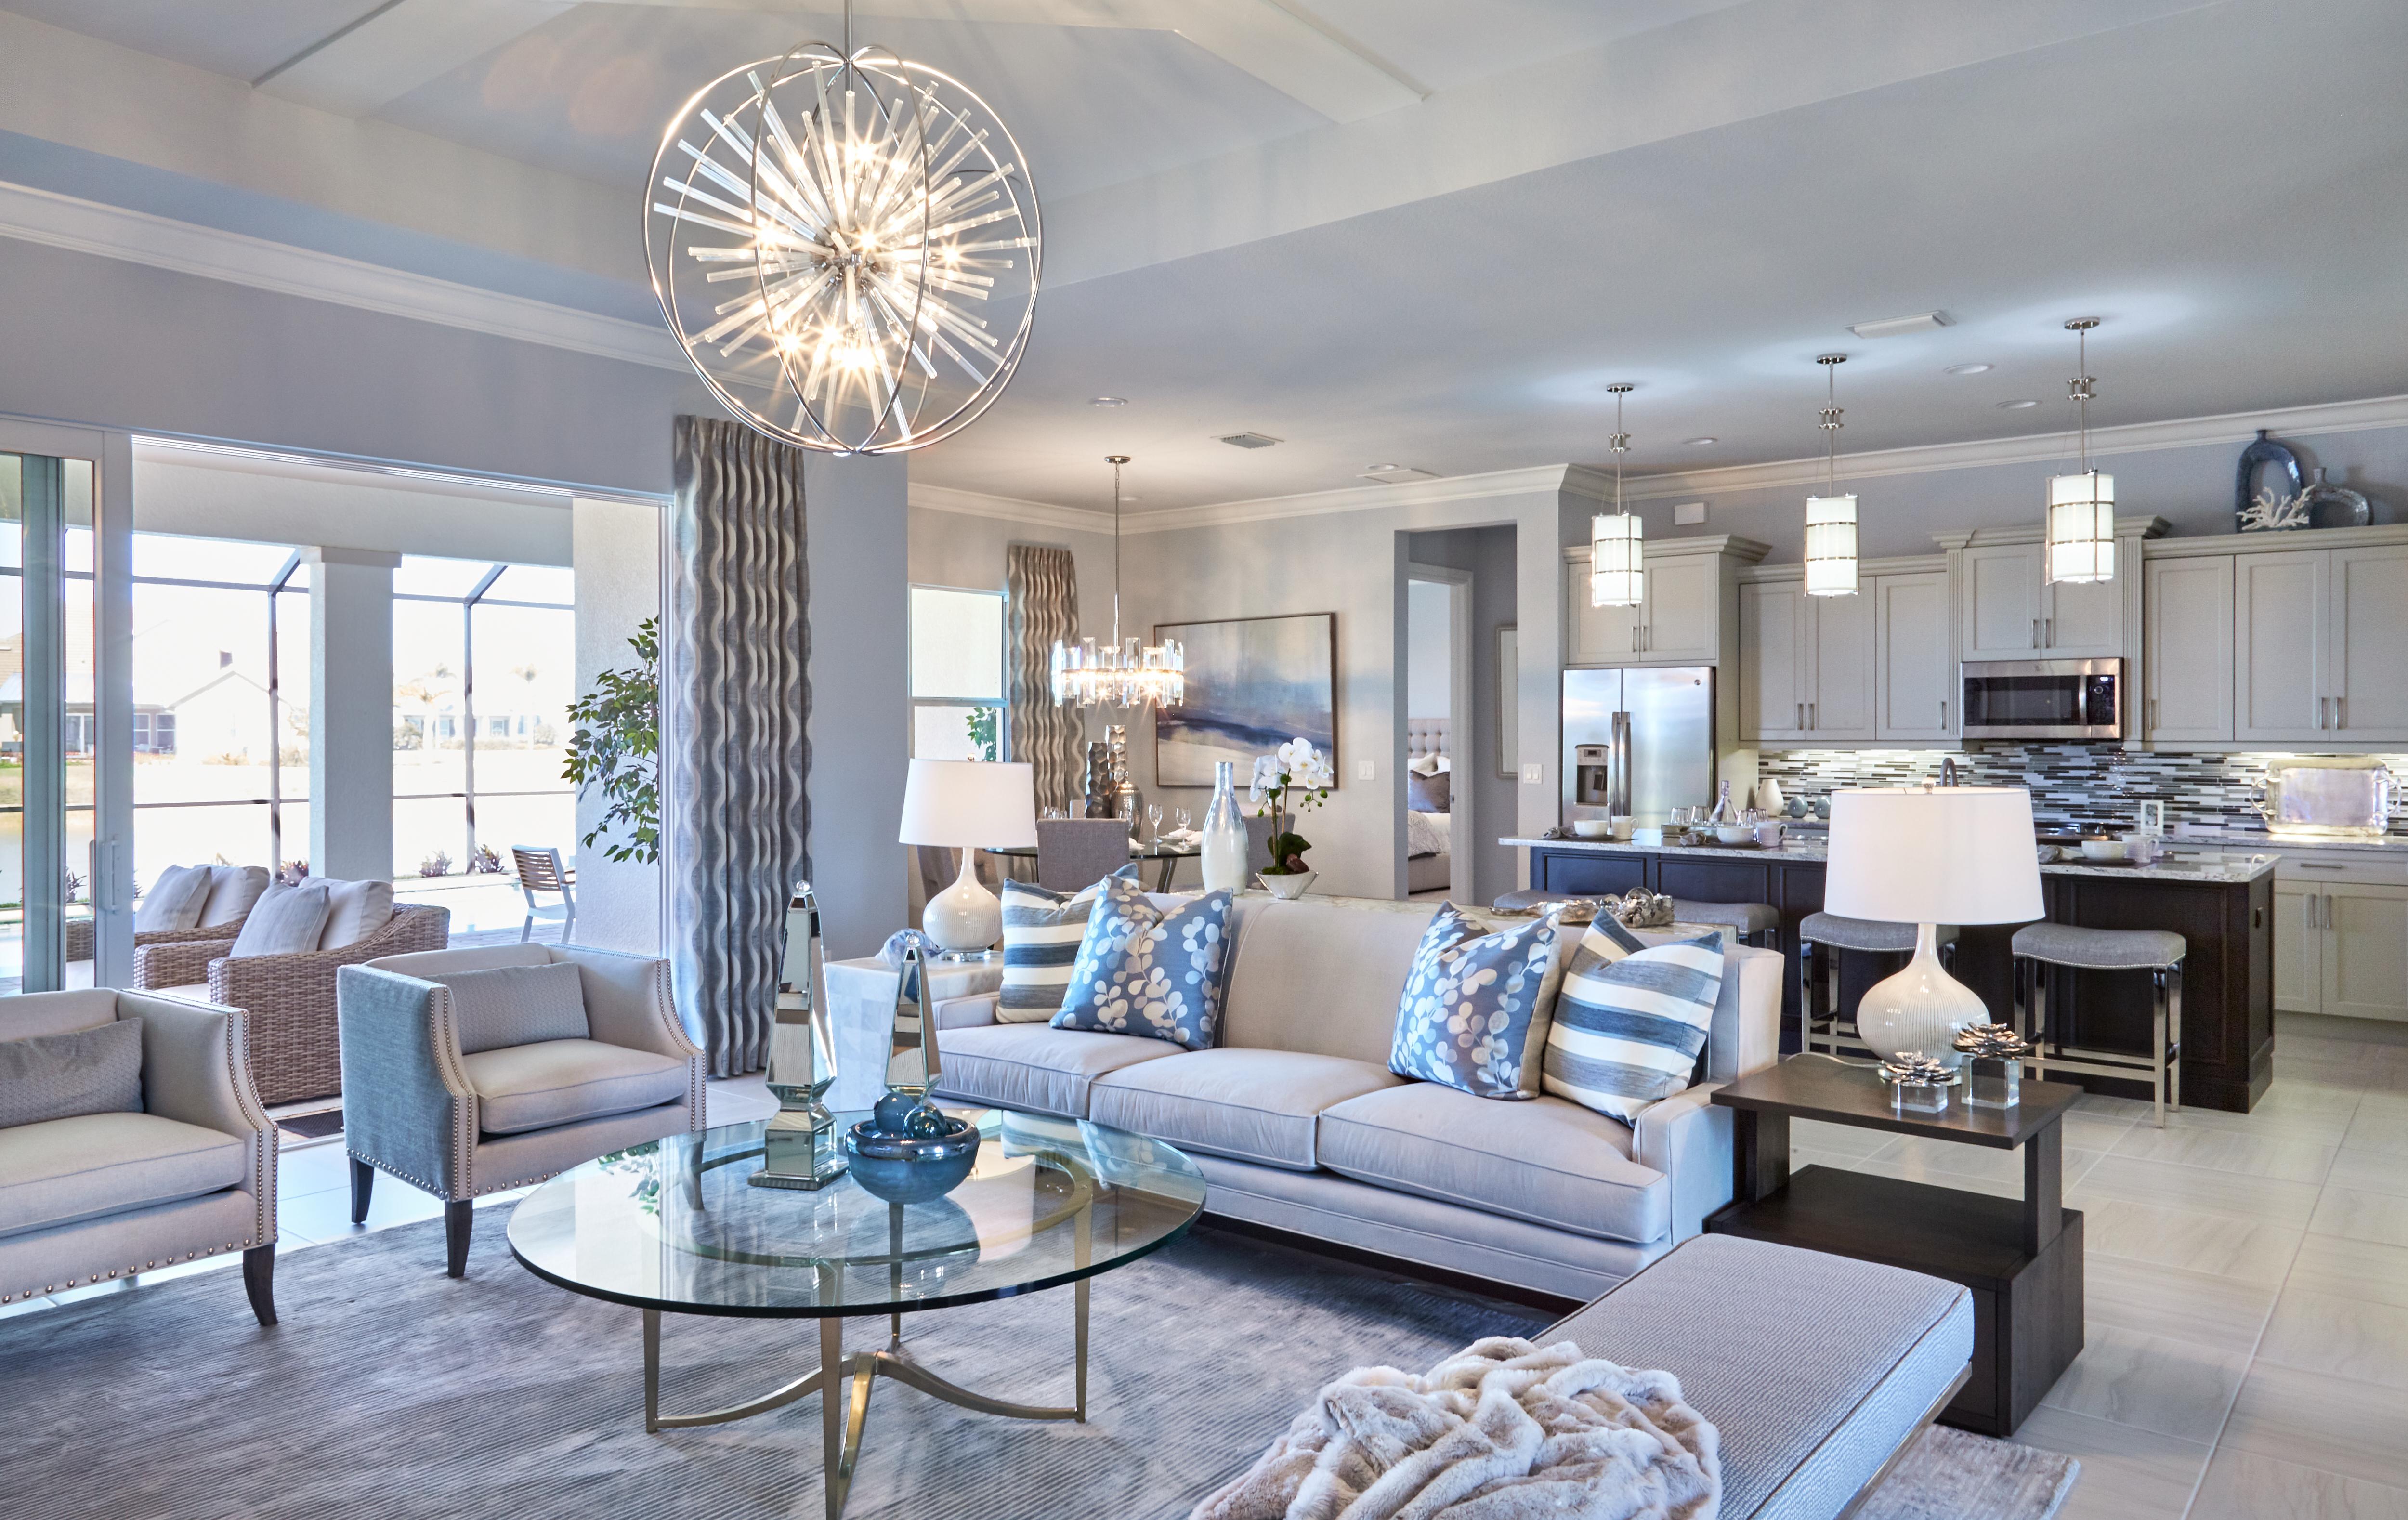 model home interiors urban home interior